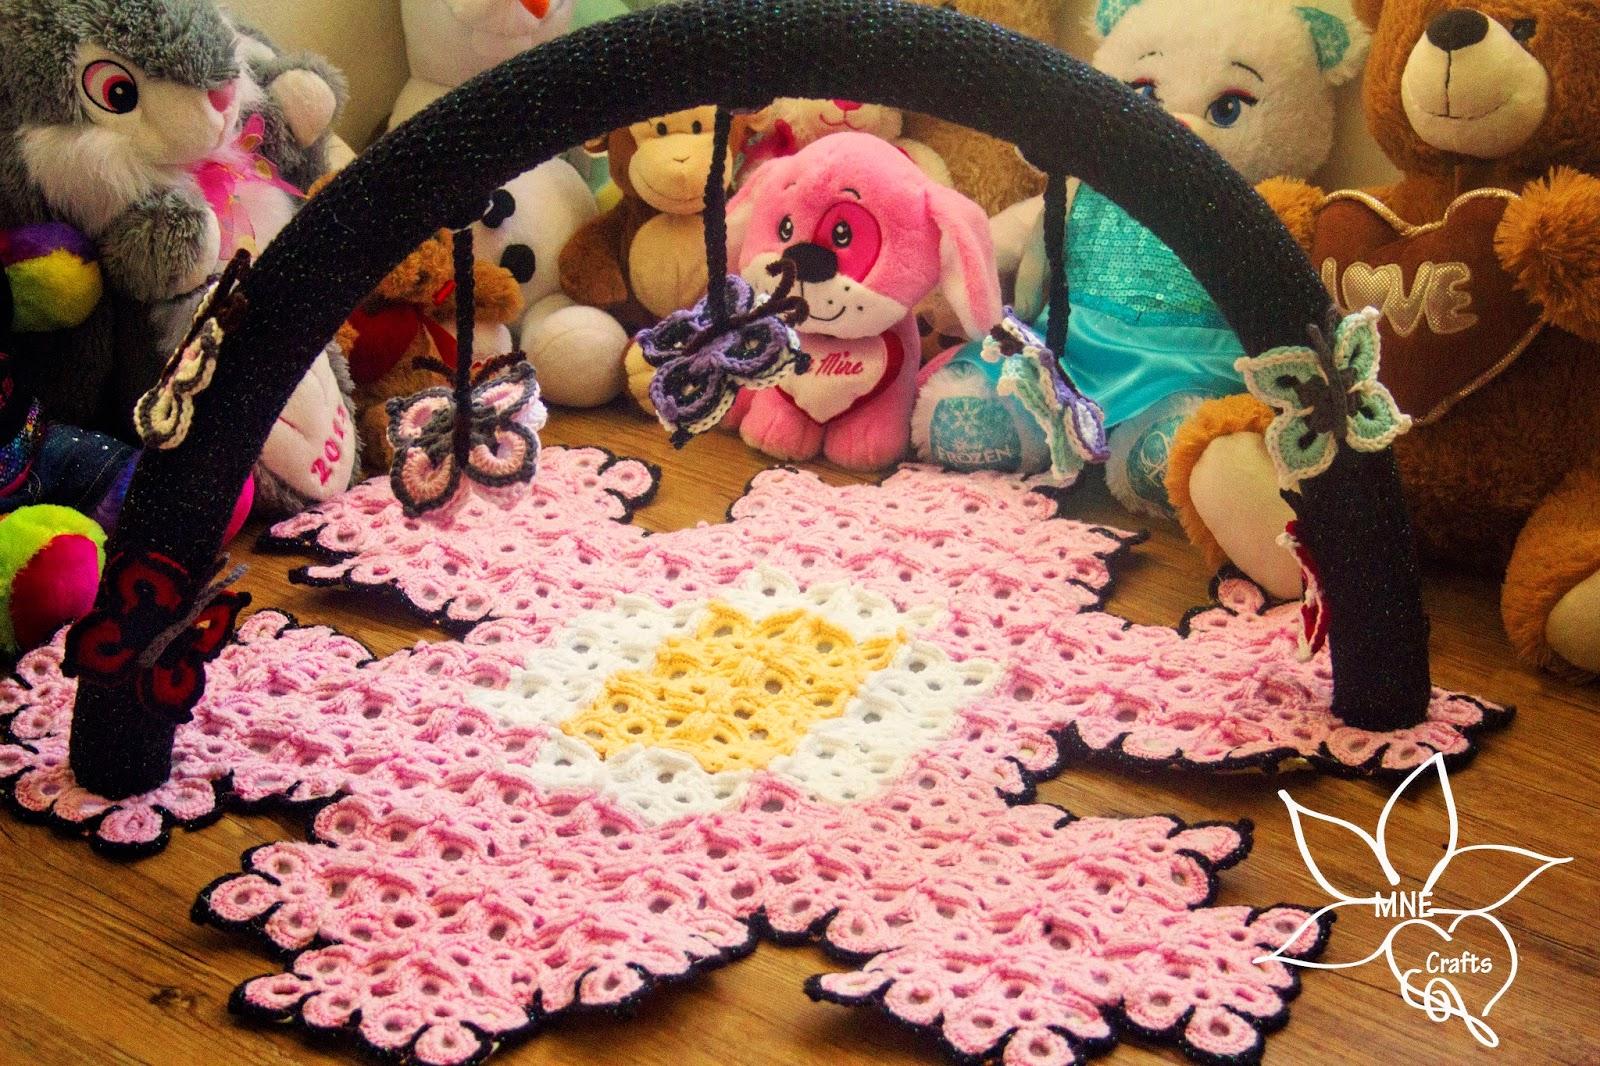 MNE Crafts: Butterfly Garden Baby Play Mat